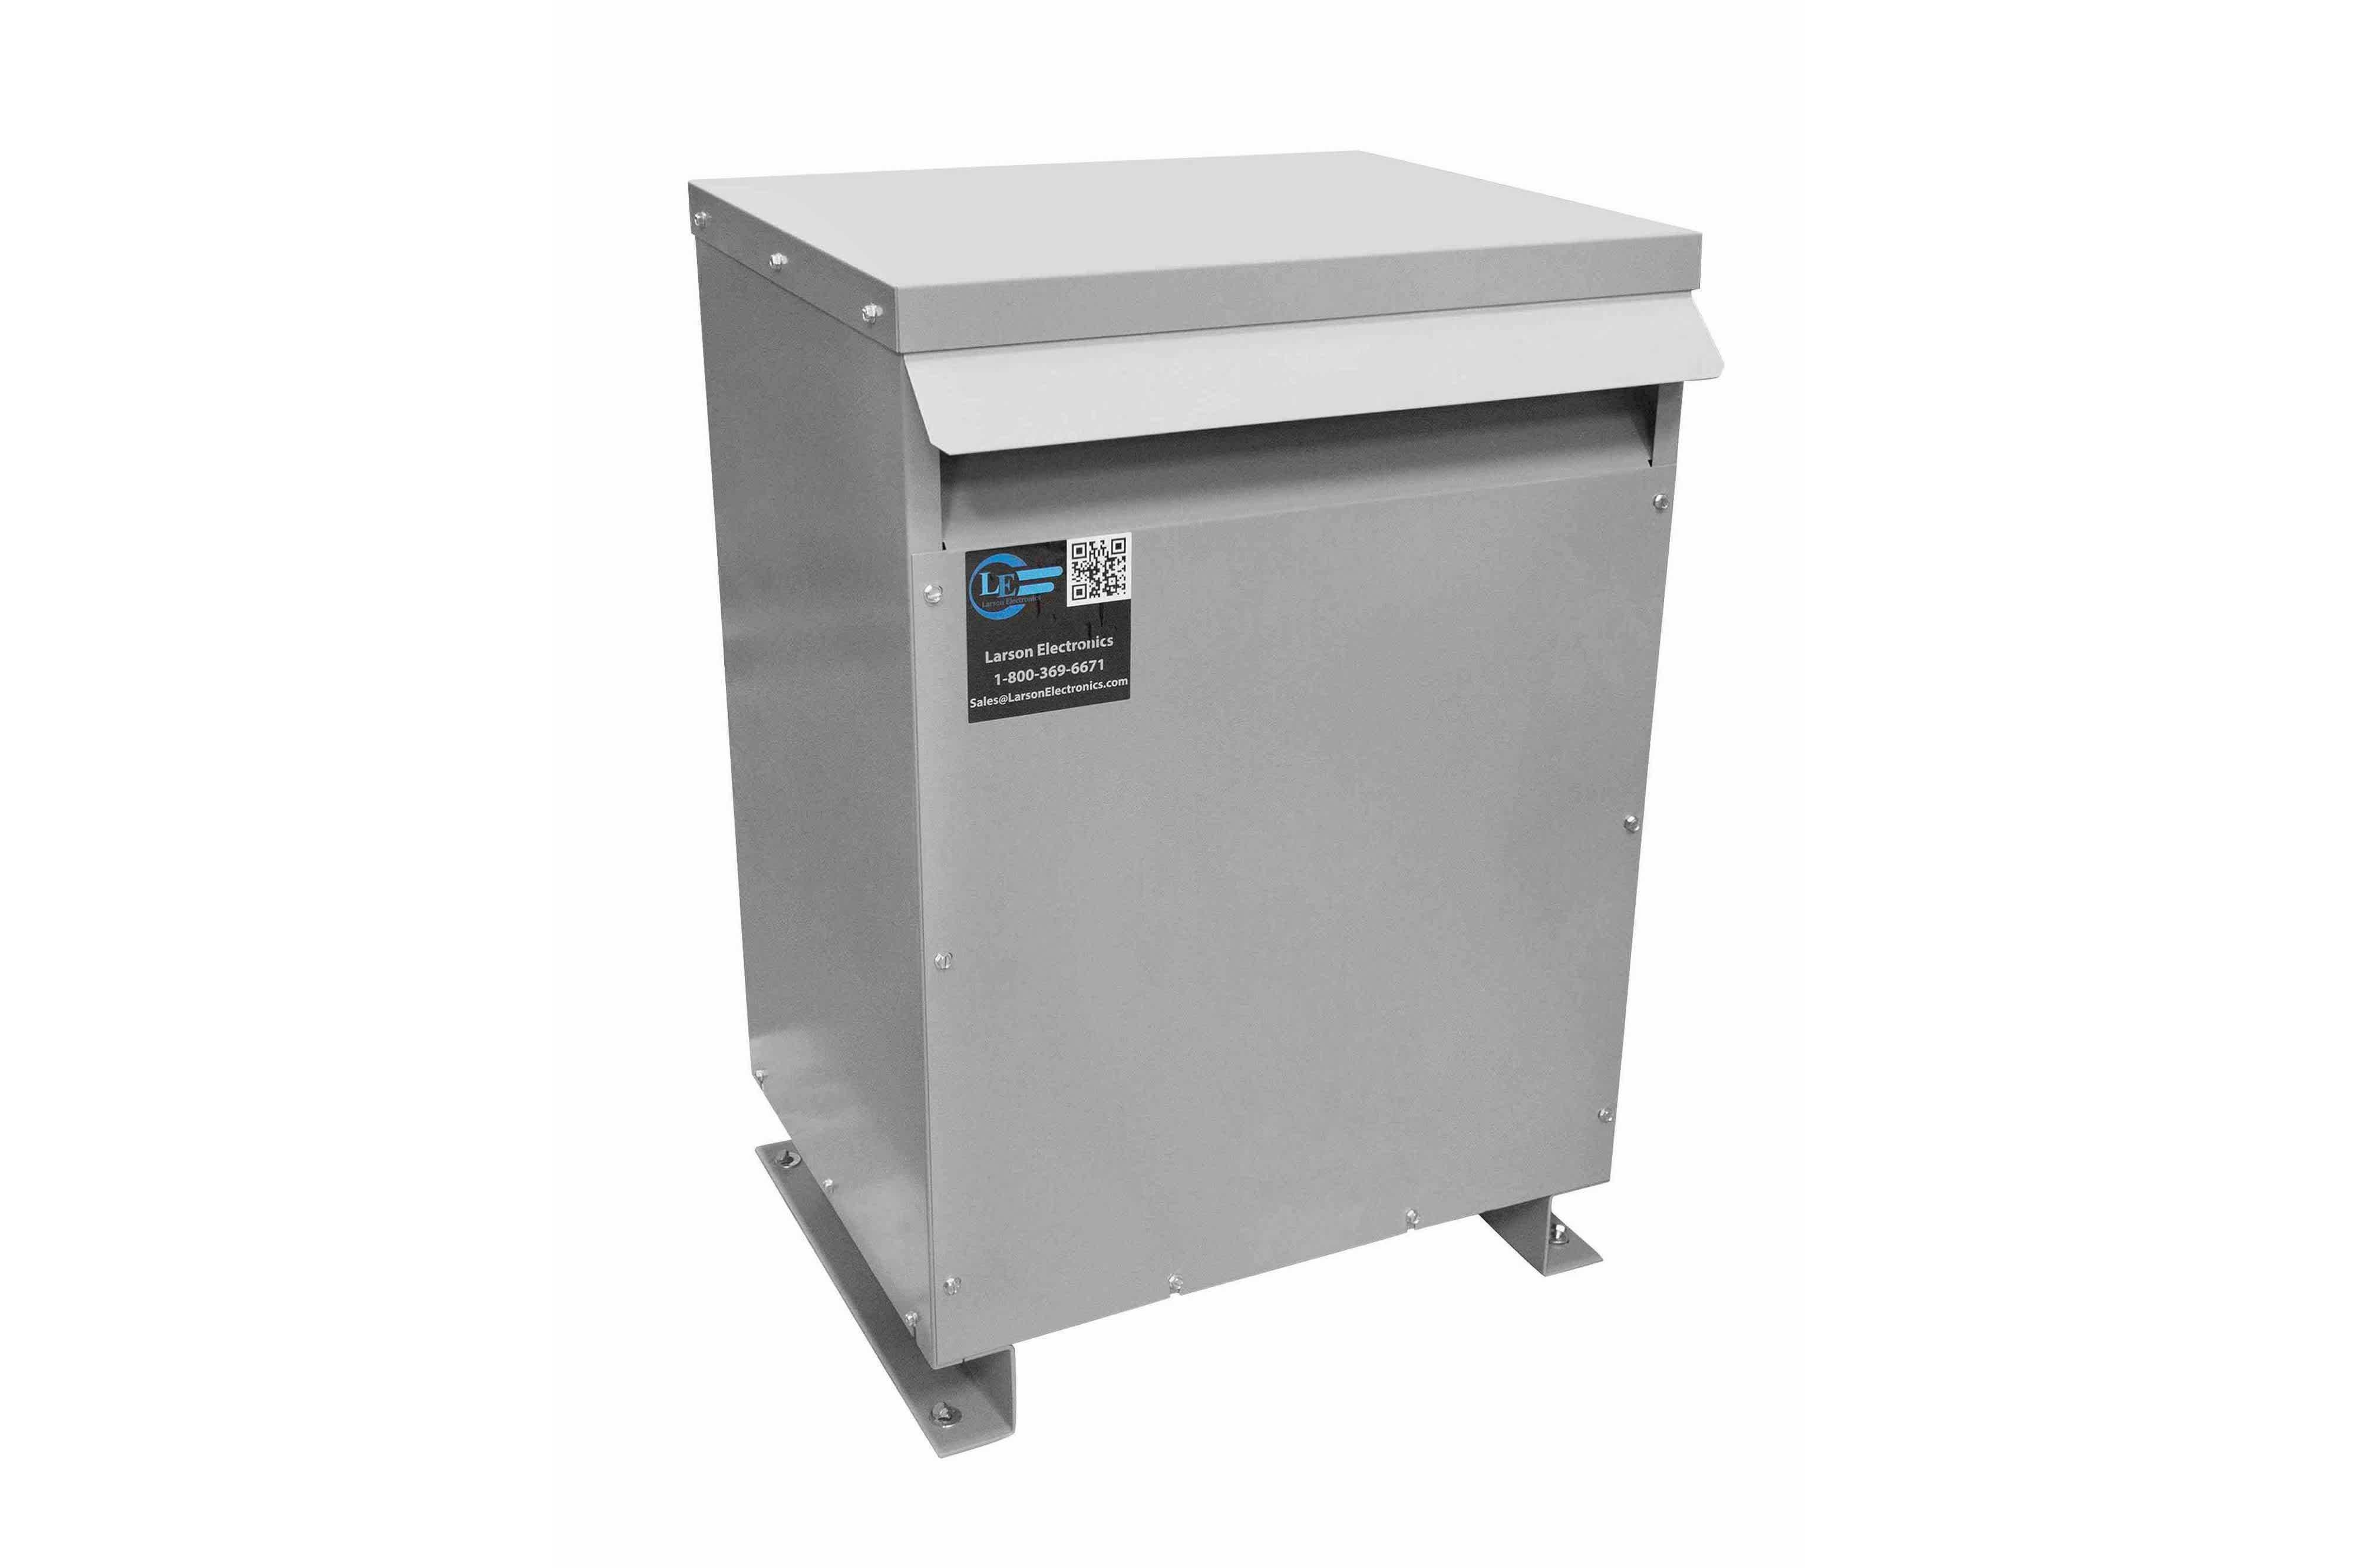 112.5 kVA 3PH Isolation Transformer, 600V Wye Primary, 480Y/277 Wye-N Secondary, N3R, Ventilated, 60 Hz